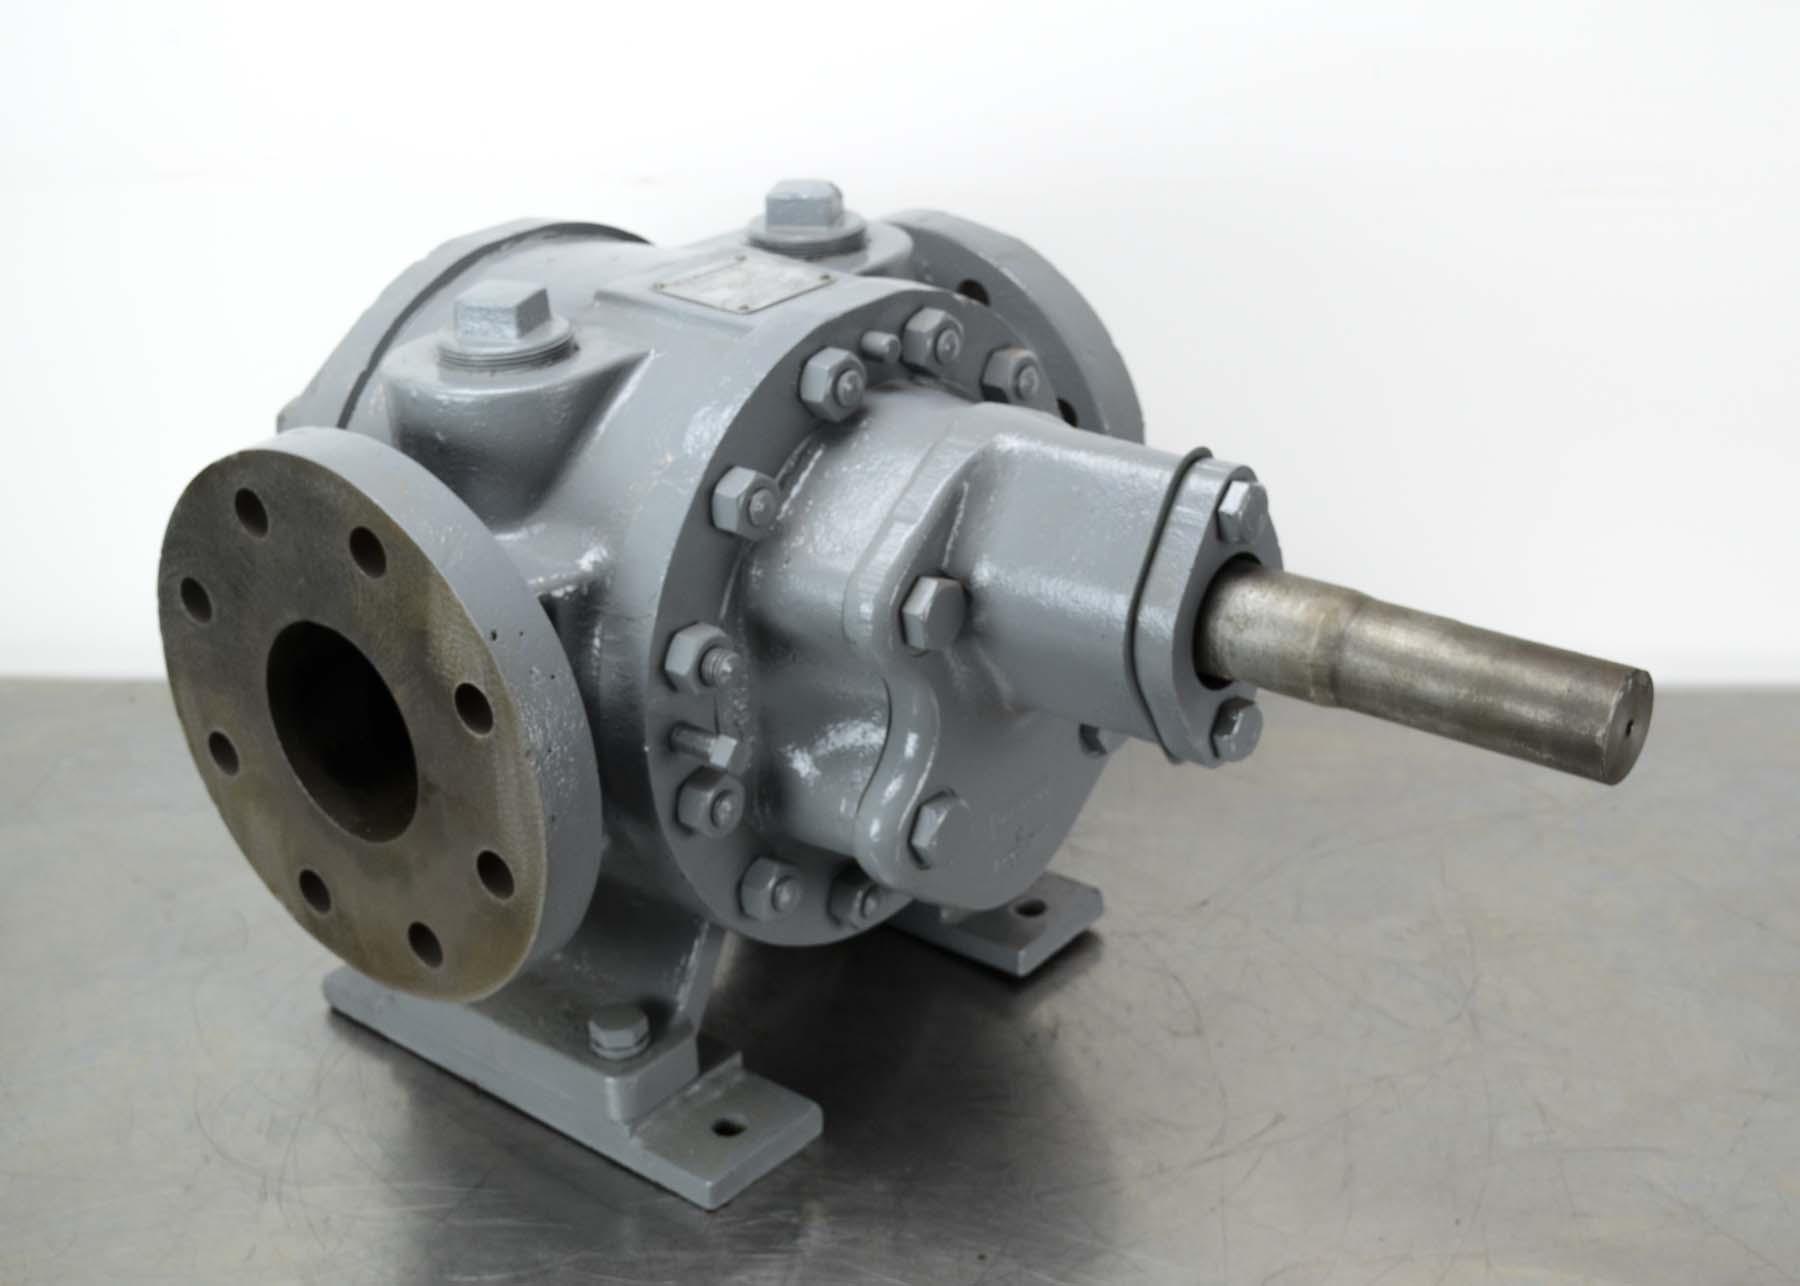 Worthington 4GRWM Pump